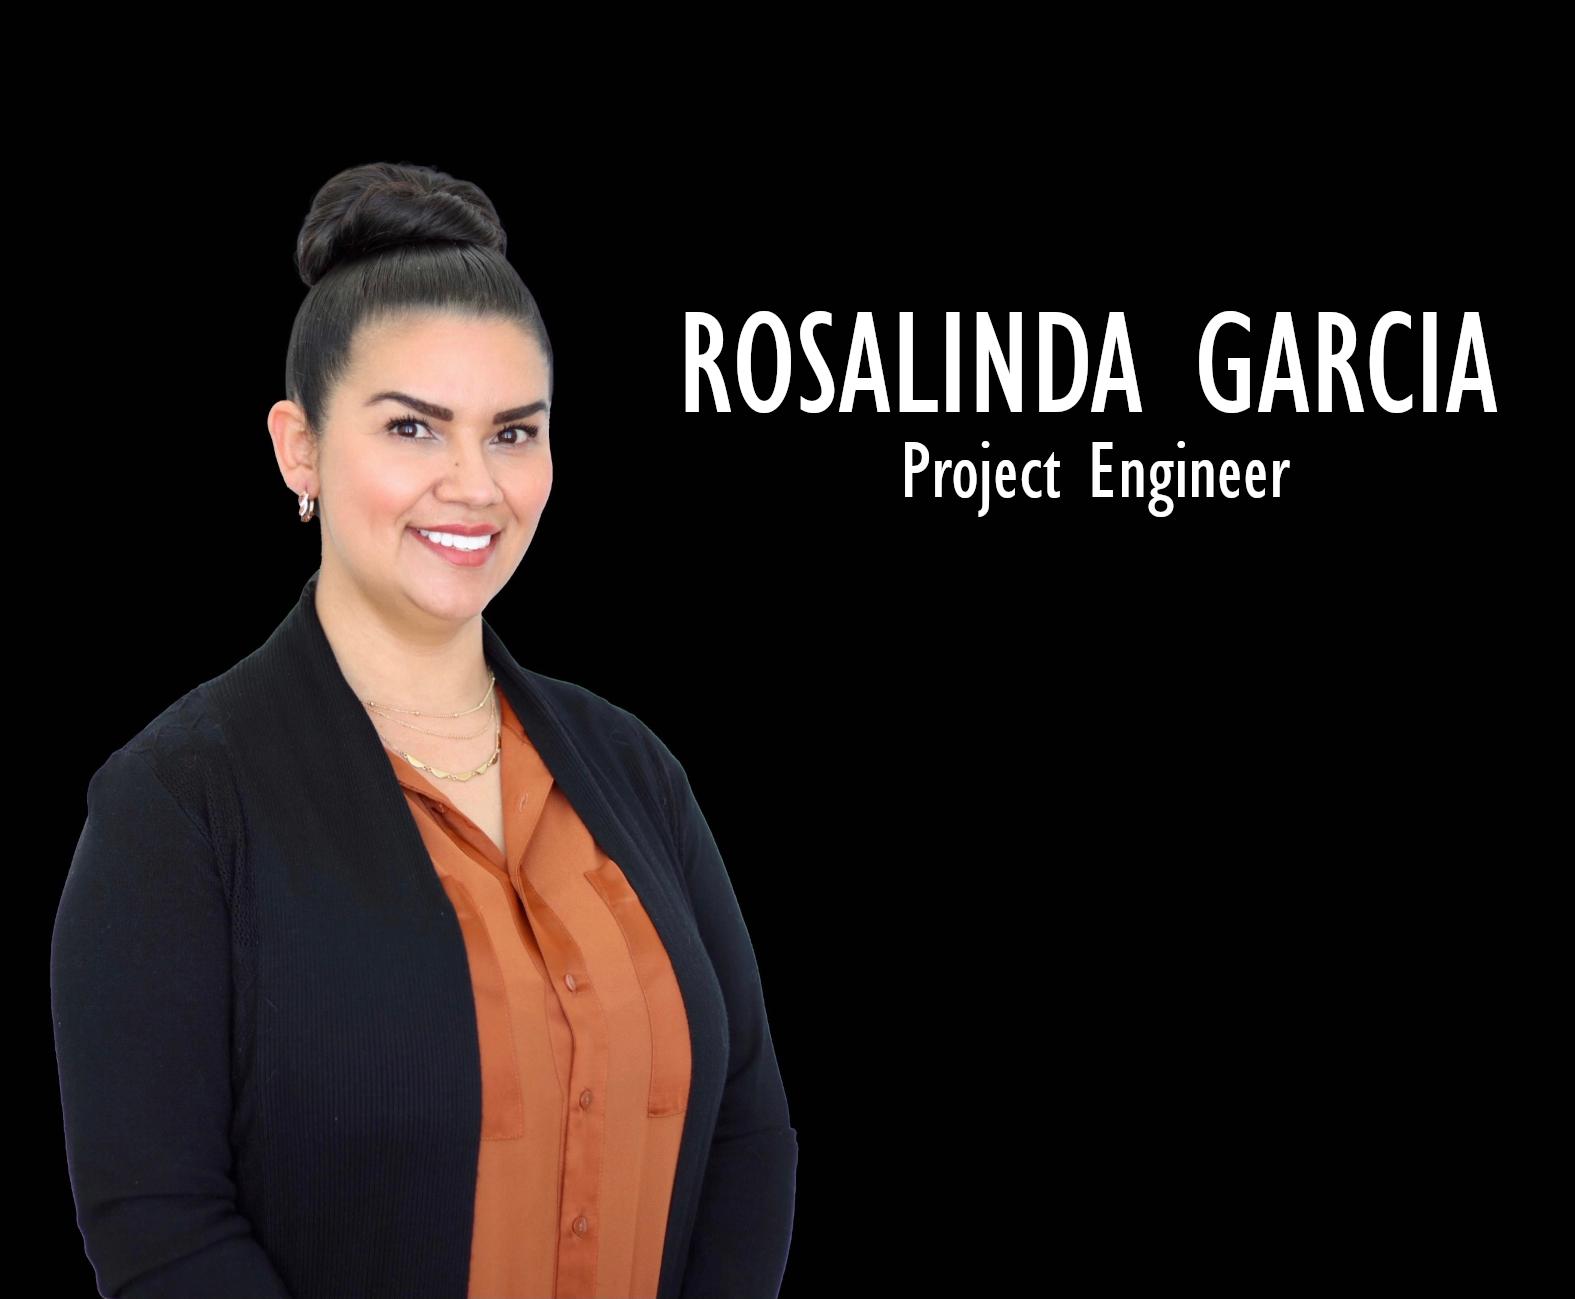 Rosalinda Garcia